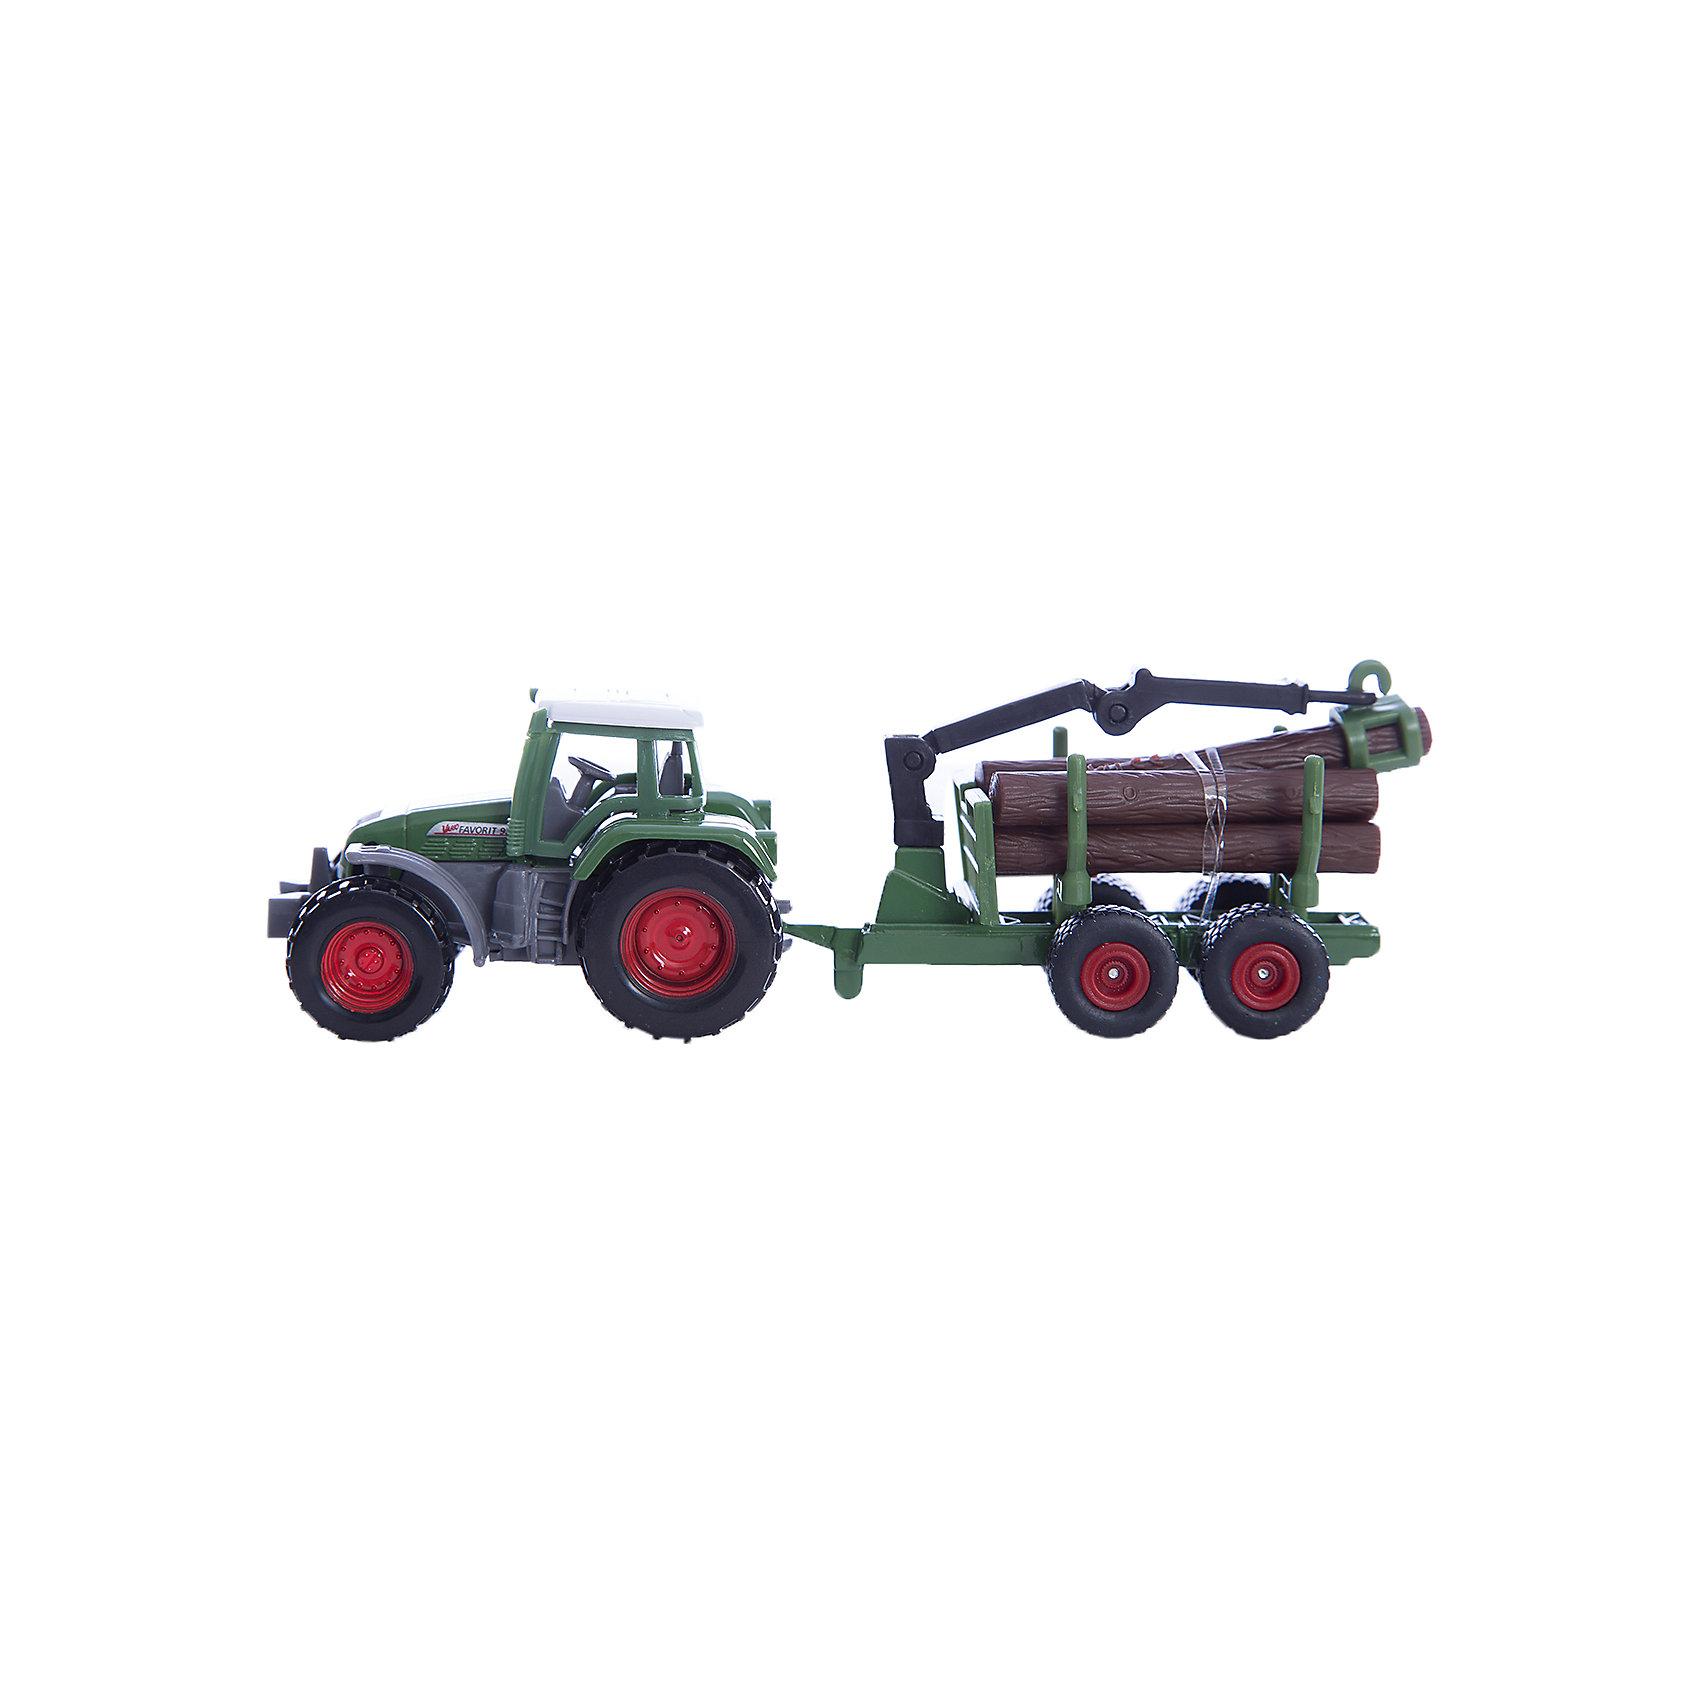 SIKU SIKU 1645 Трактор с прицепом для перевозки бревен siku siku 1007 bmw 645i cabrio